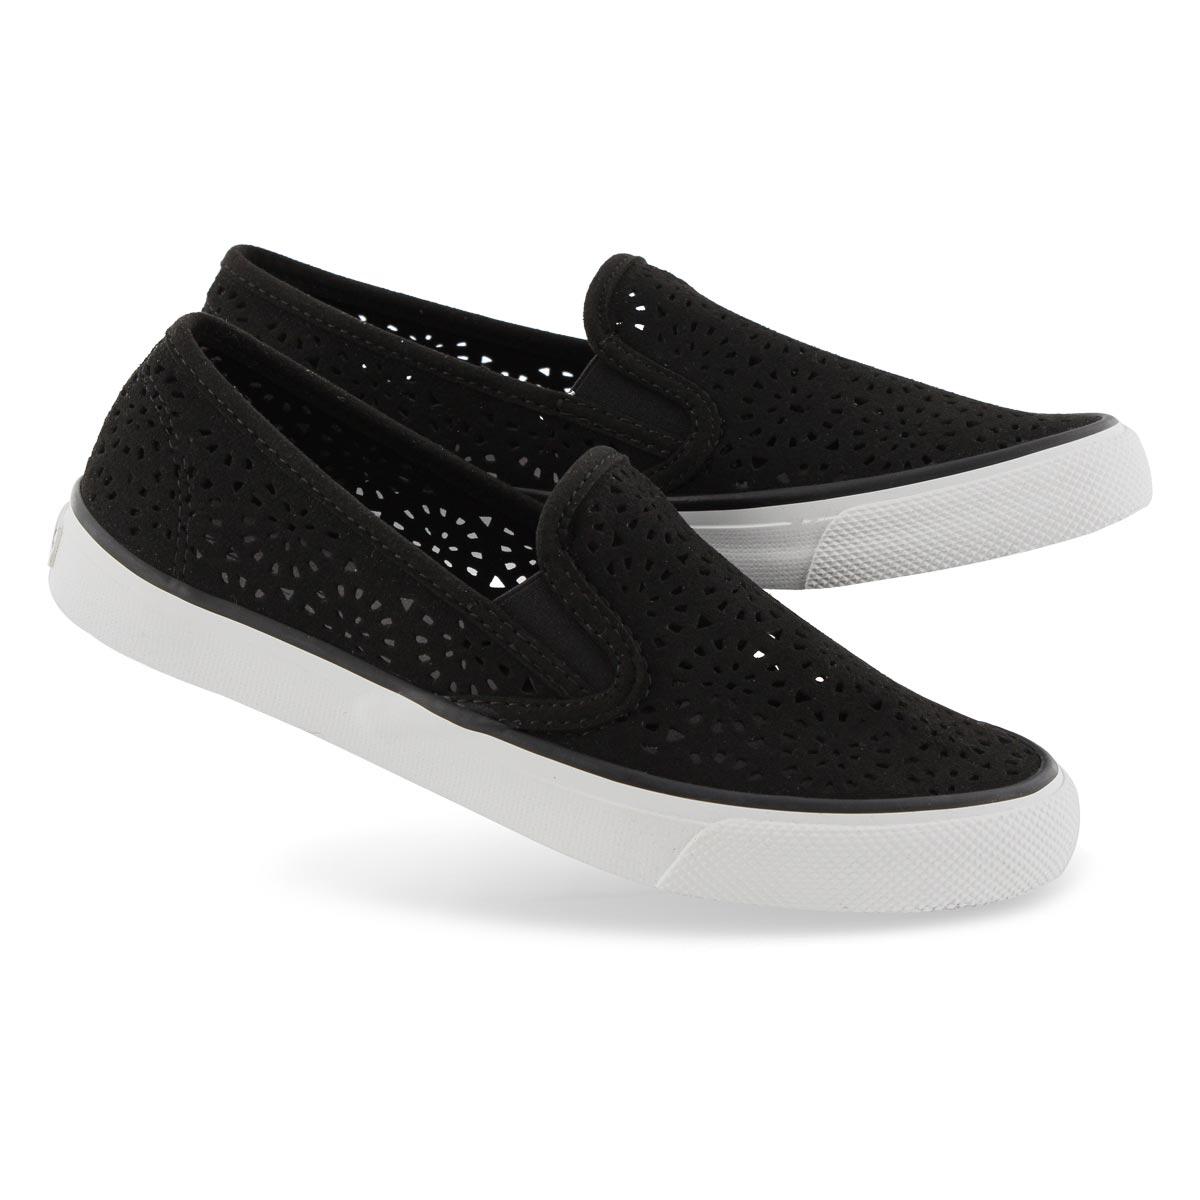 Lds Seaside Perf black slip on loafers